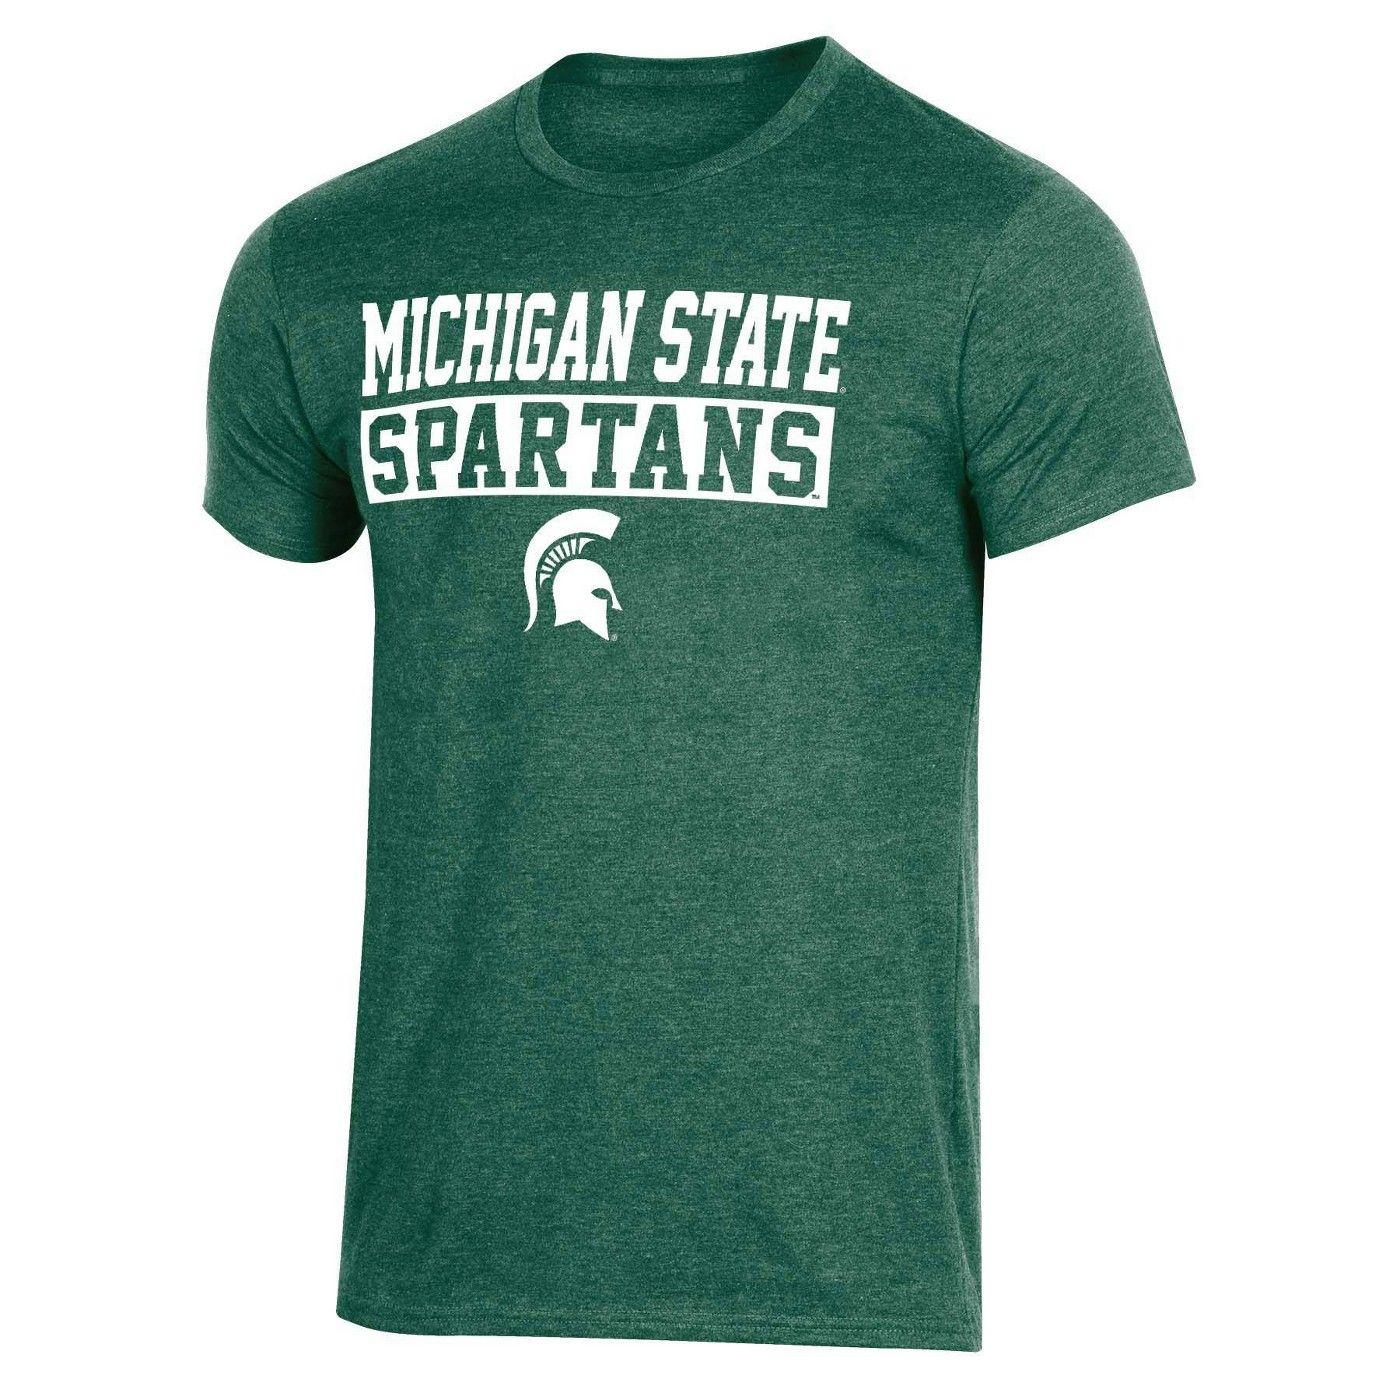 Ncaa Michigan State Spartans Men S Short Sleeve Crew Neck T Shirt In 2020 Men Short Sleeve Shirts Michigan State Spartans [ 1400 x 1400 Pixel ]